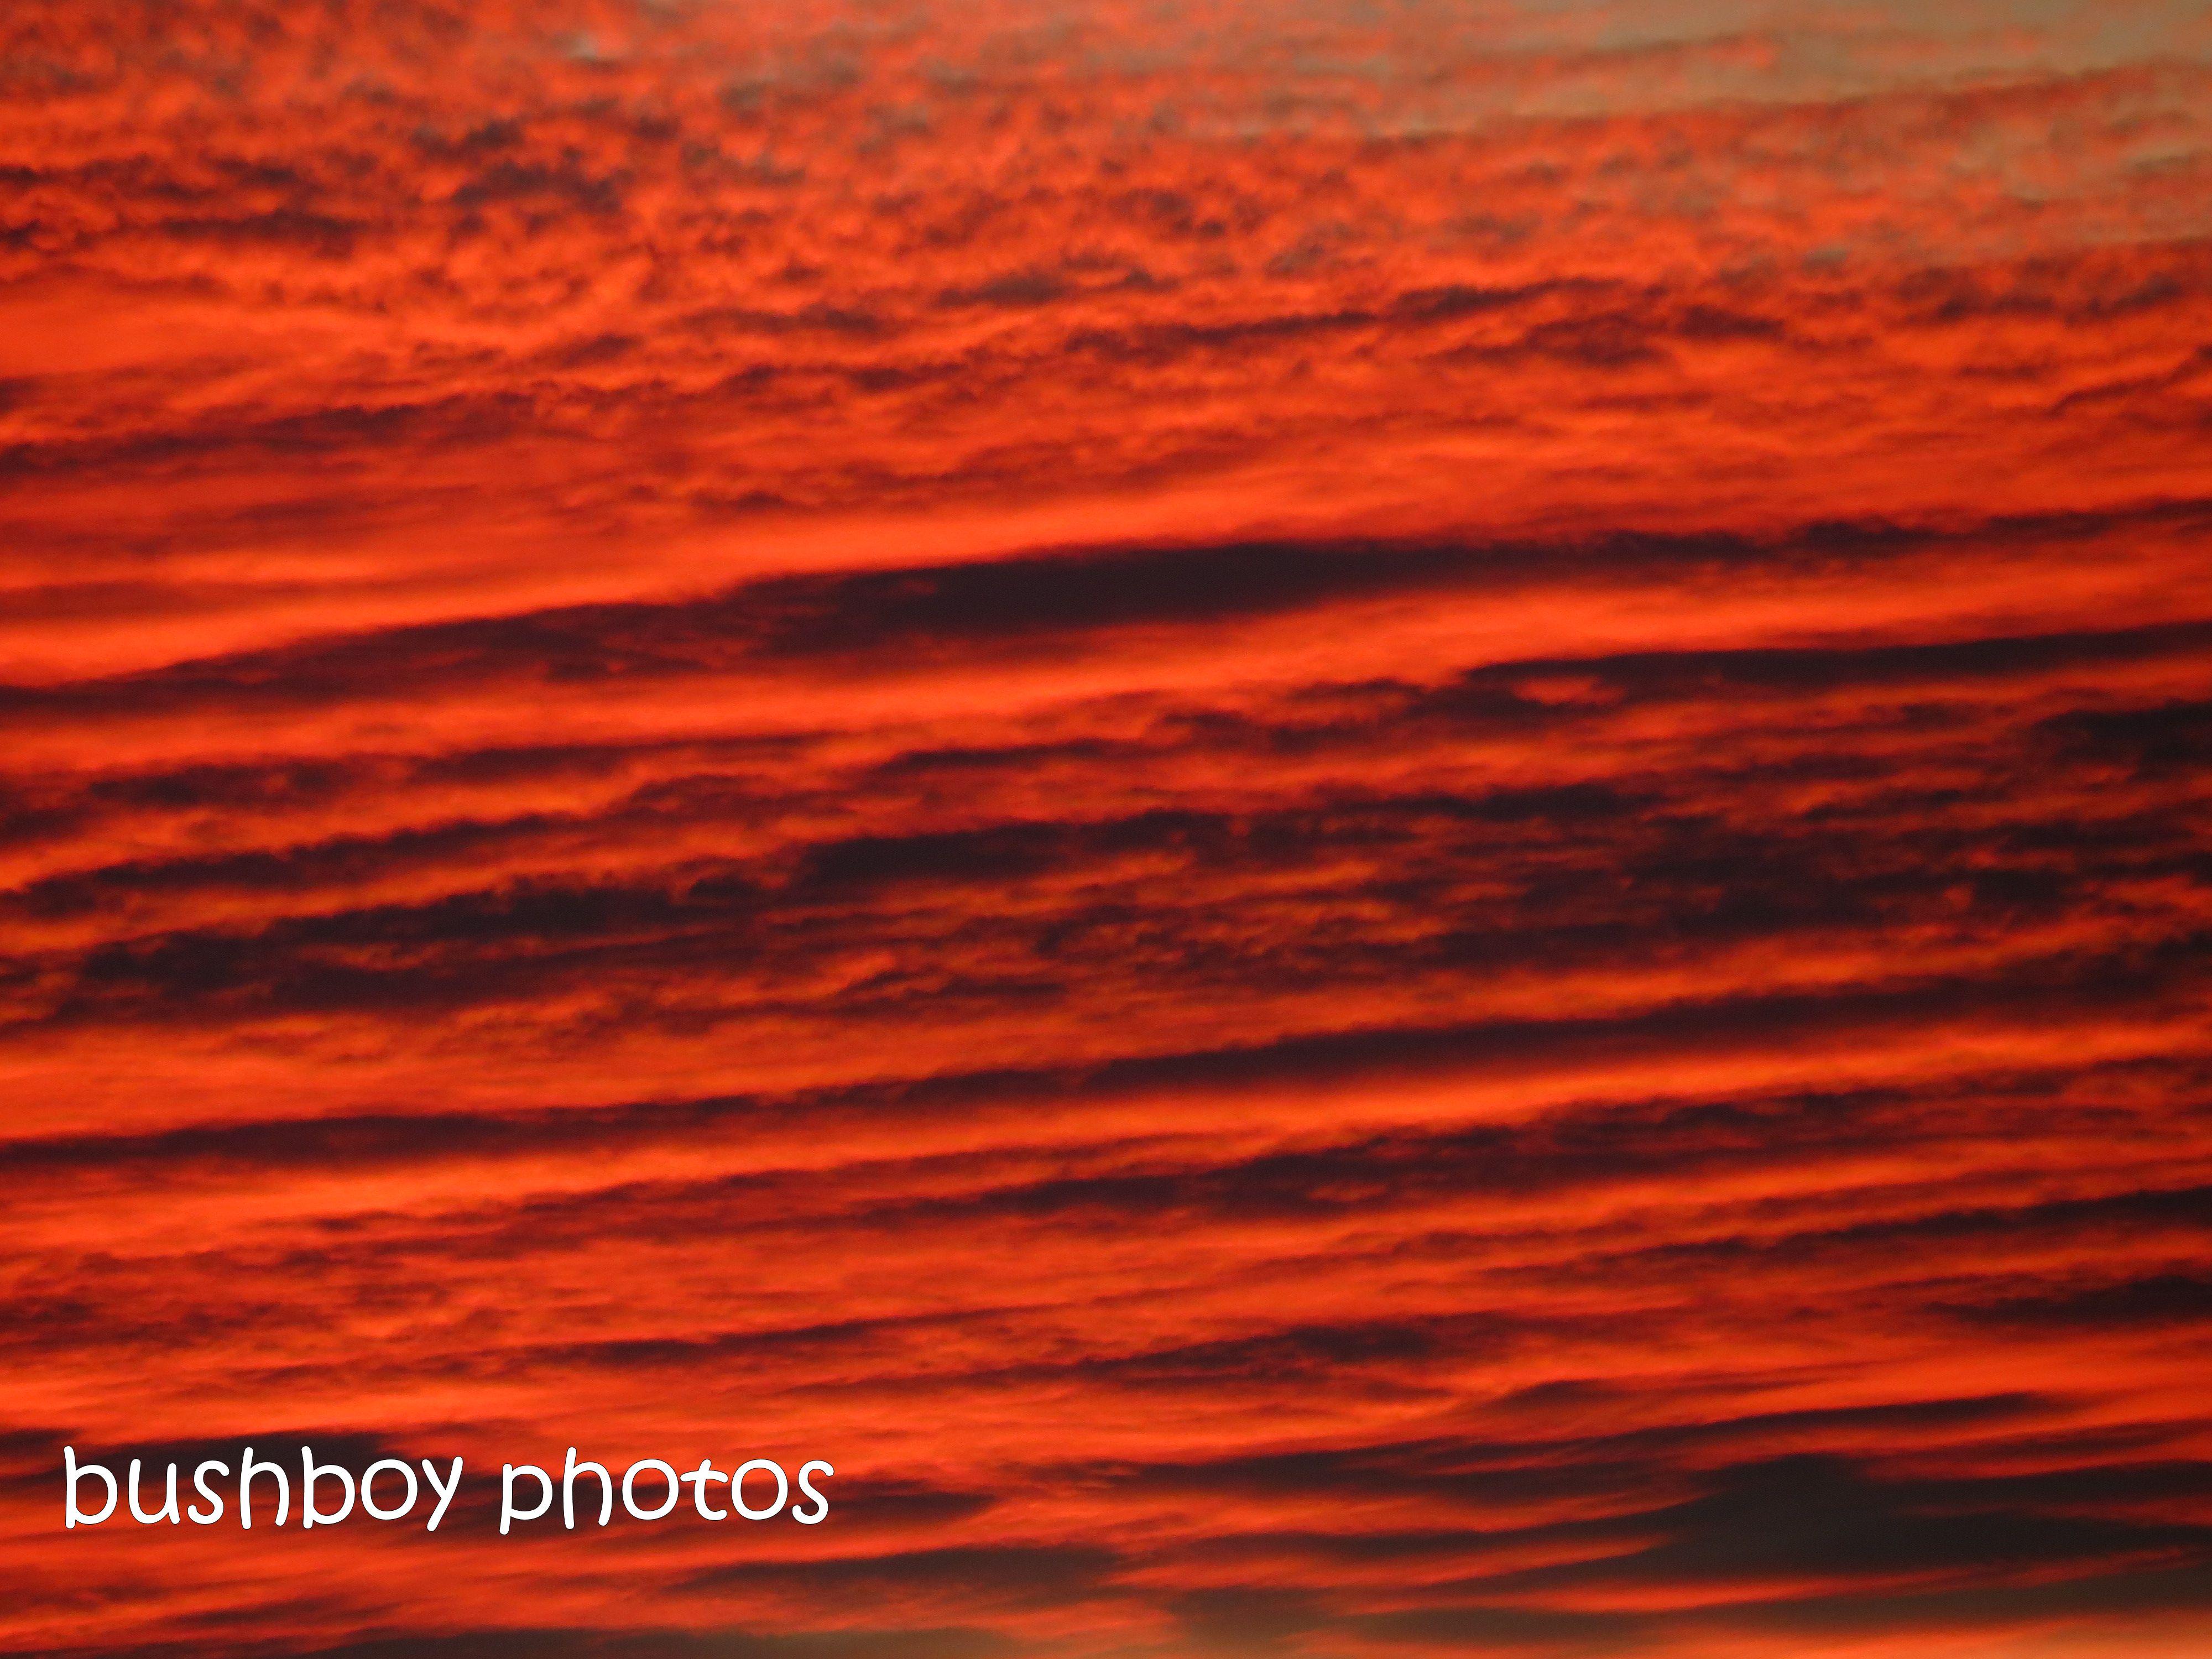 sunset11_grafton_june 2014